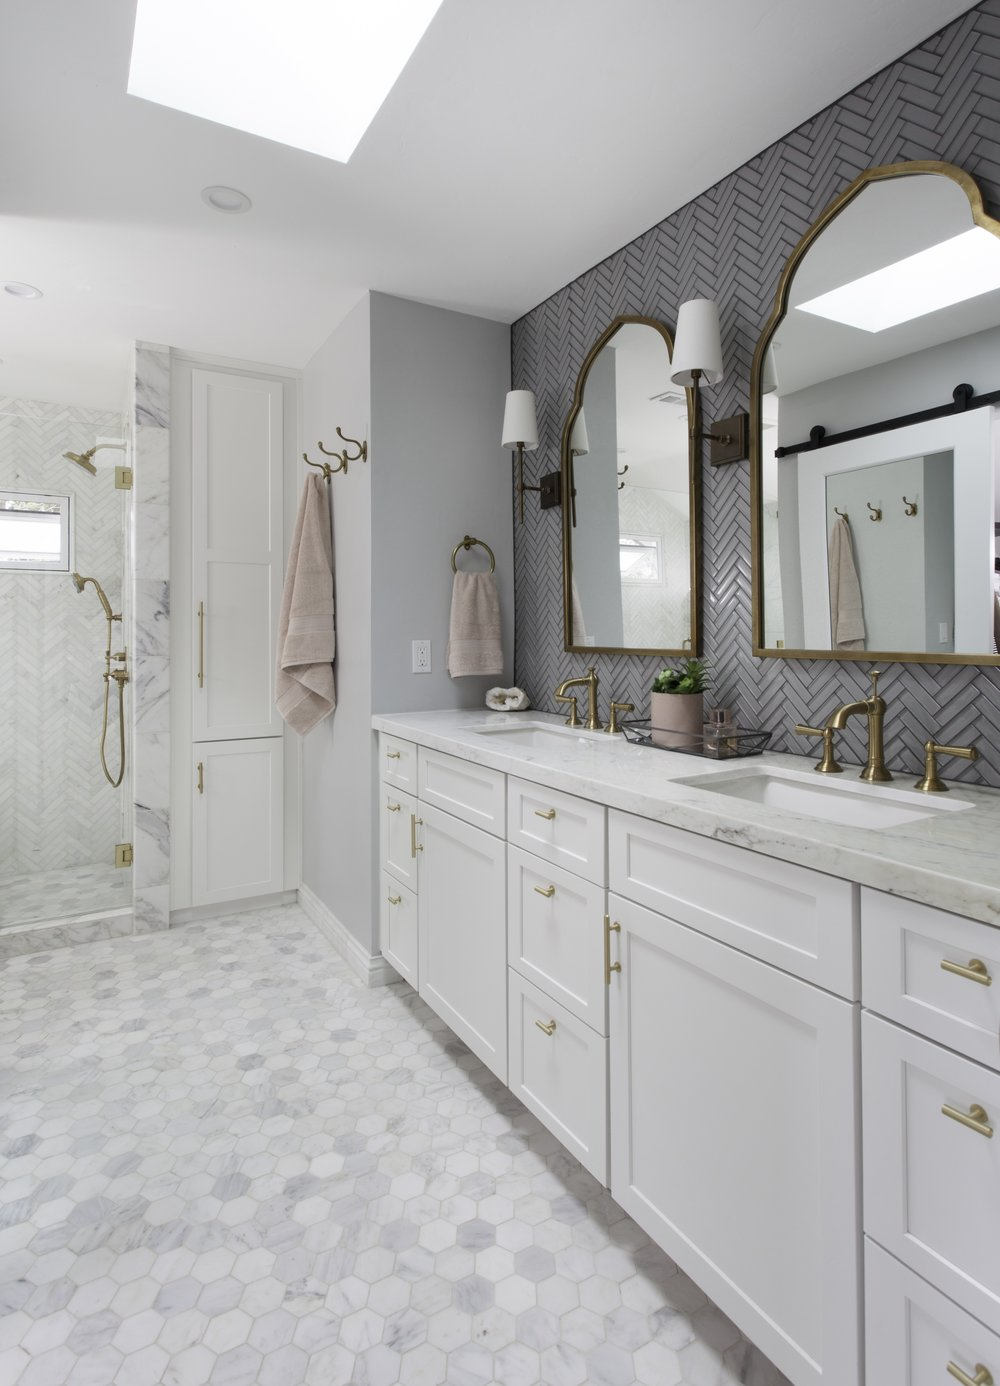 Signature Designs Kitchen Bath Bonnie Bagley Catlin.jpg